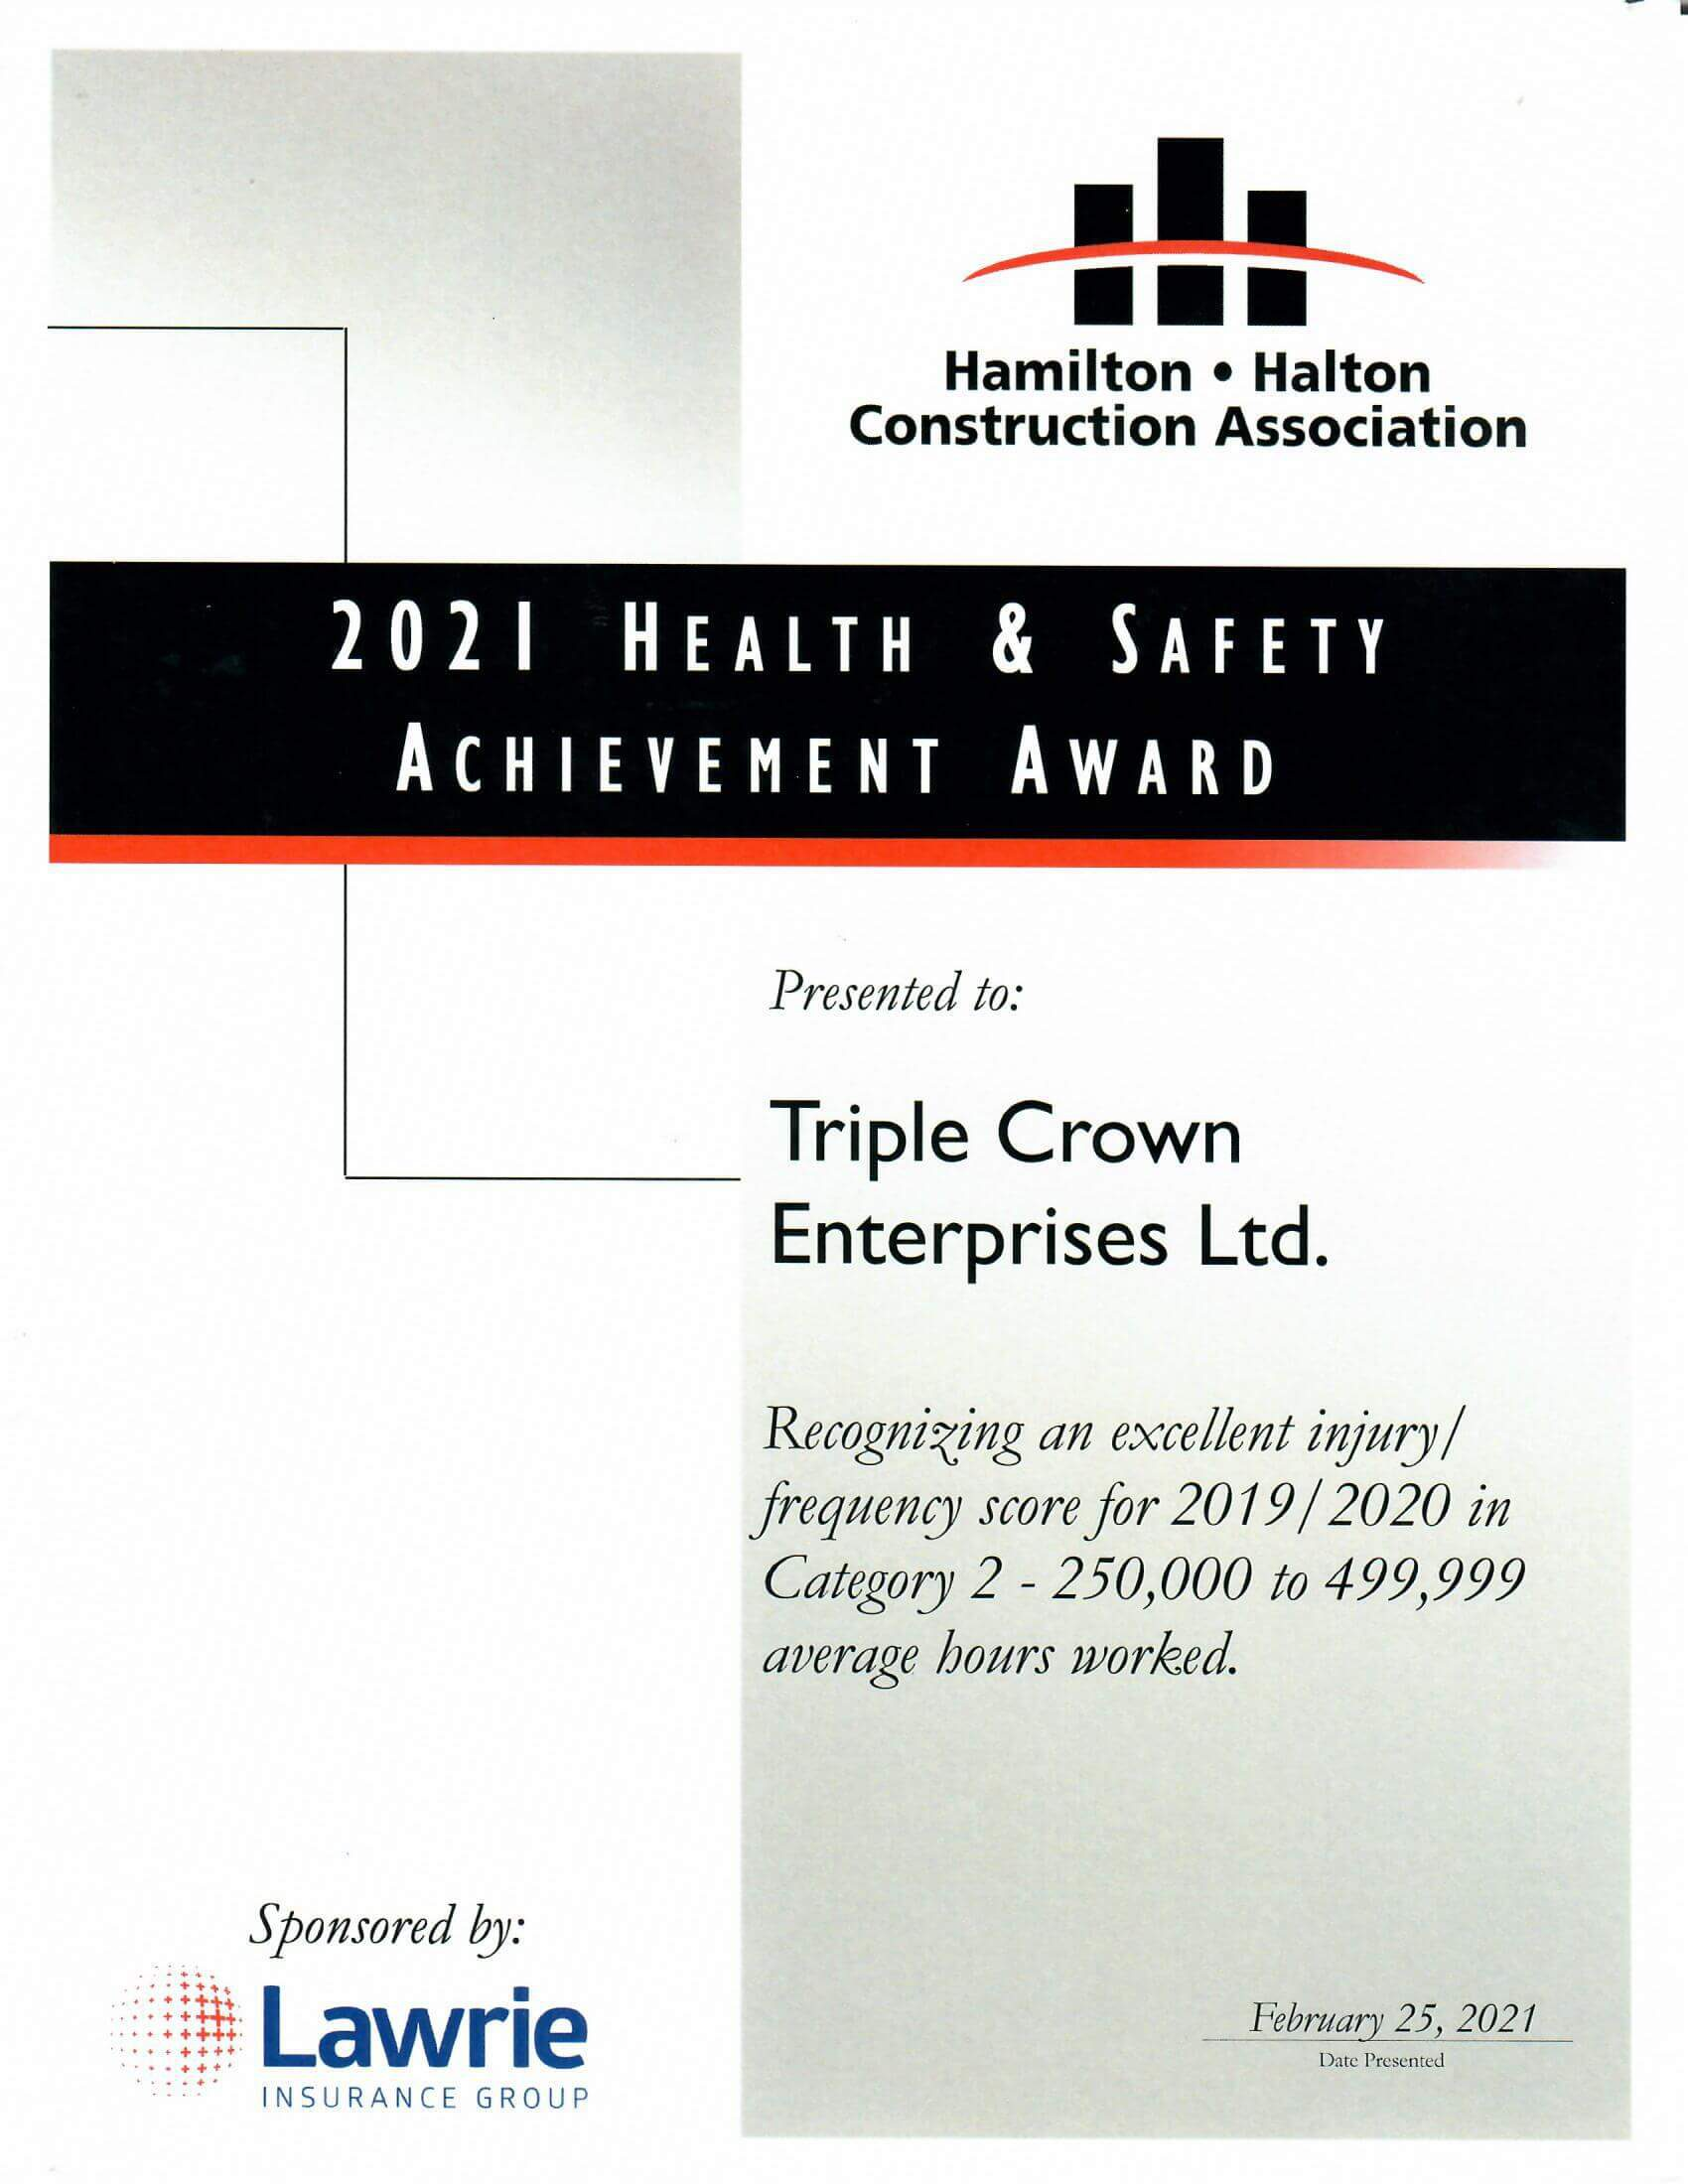 Hamilton Halton Construction Association (HHCA) Health & Safety Award 2018